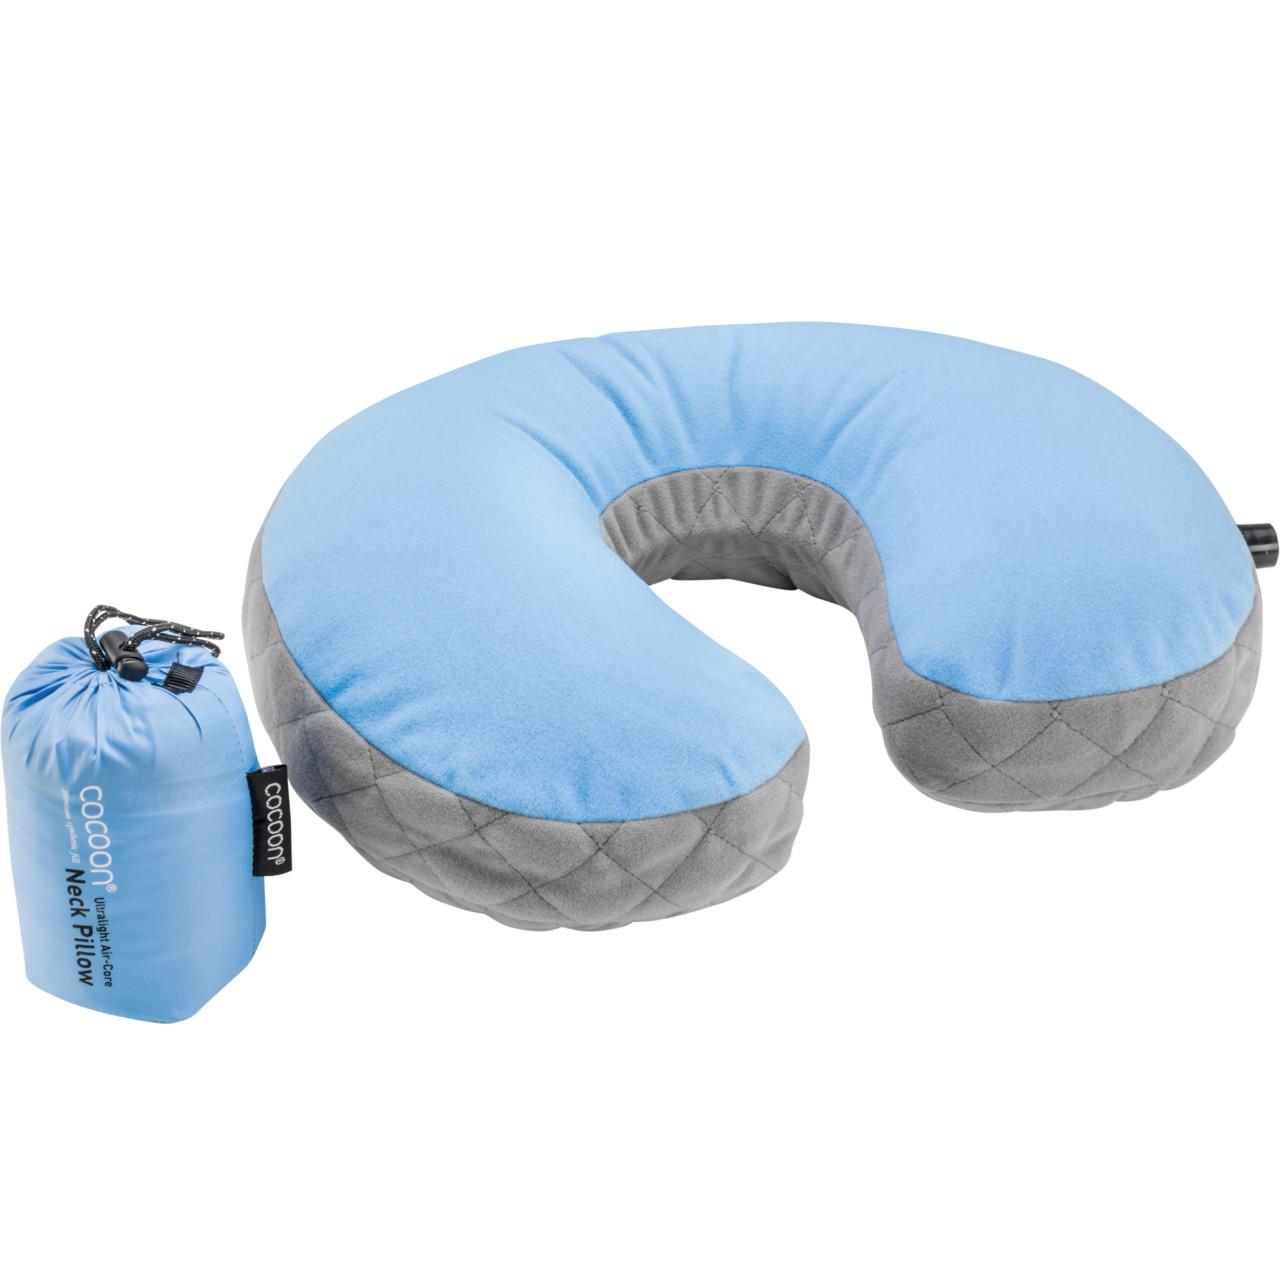 buy cocoon neck pillow super soft